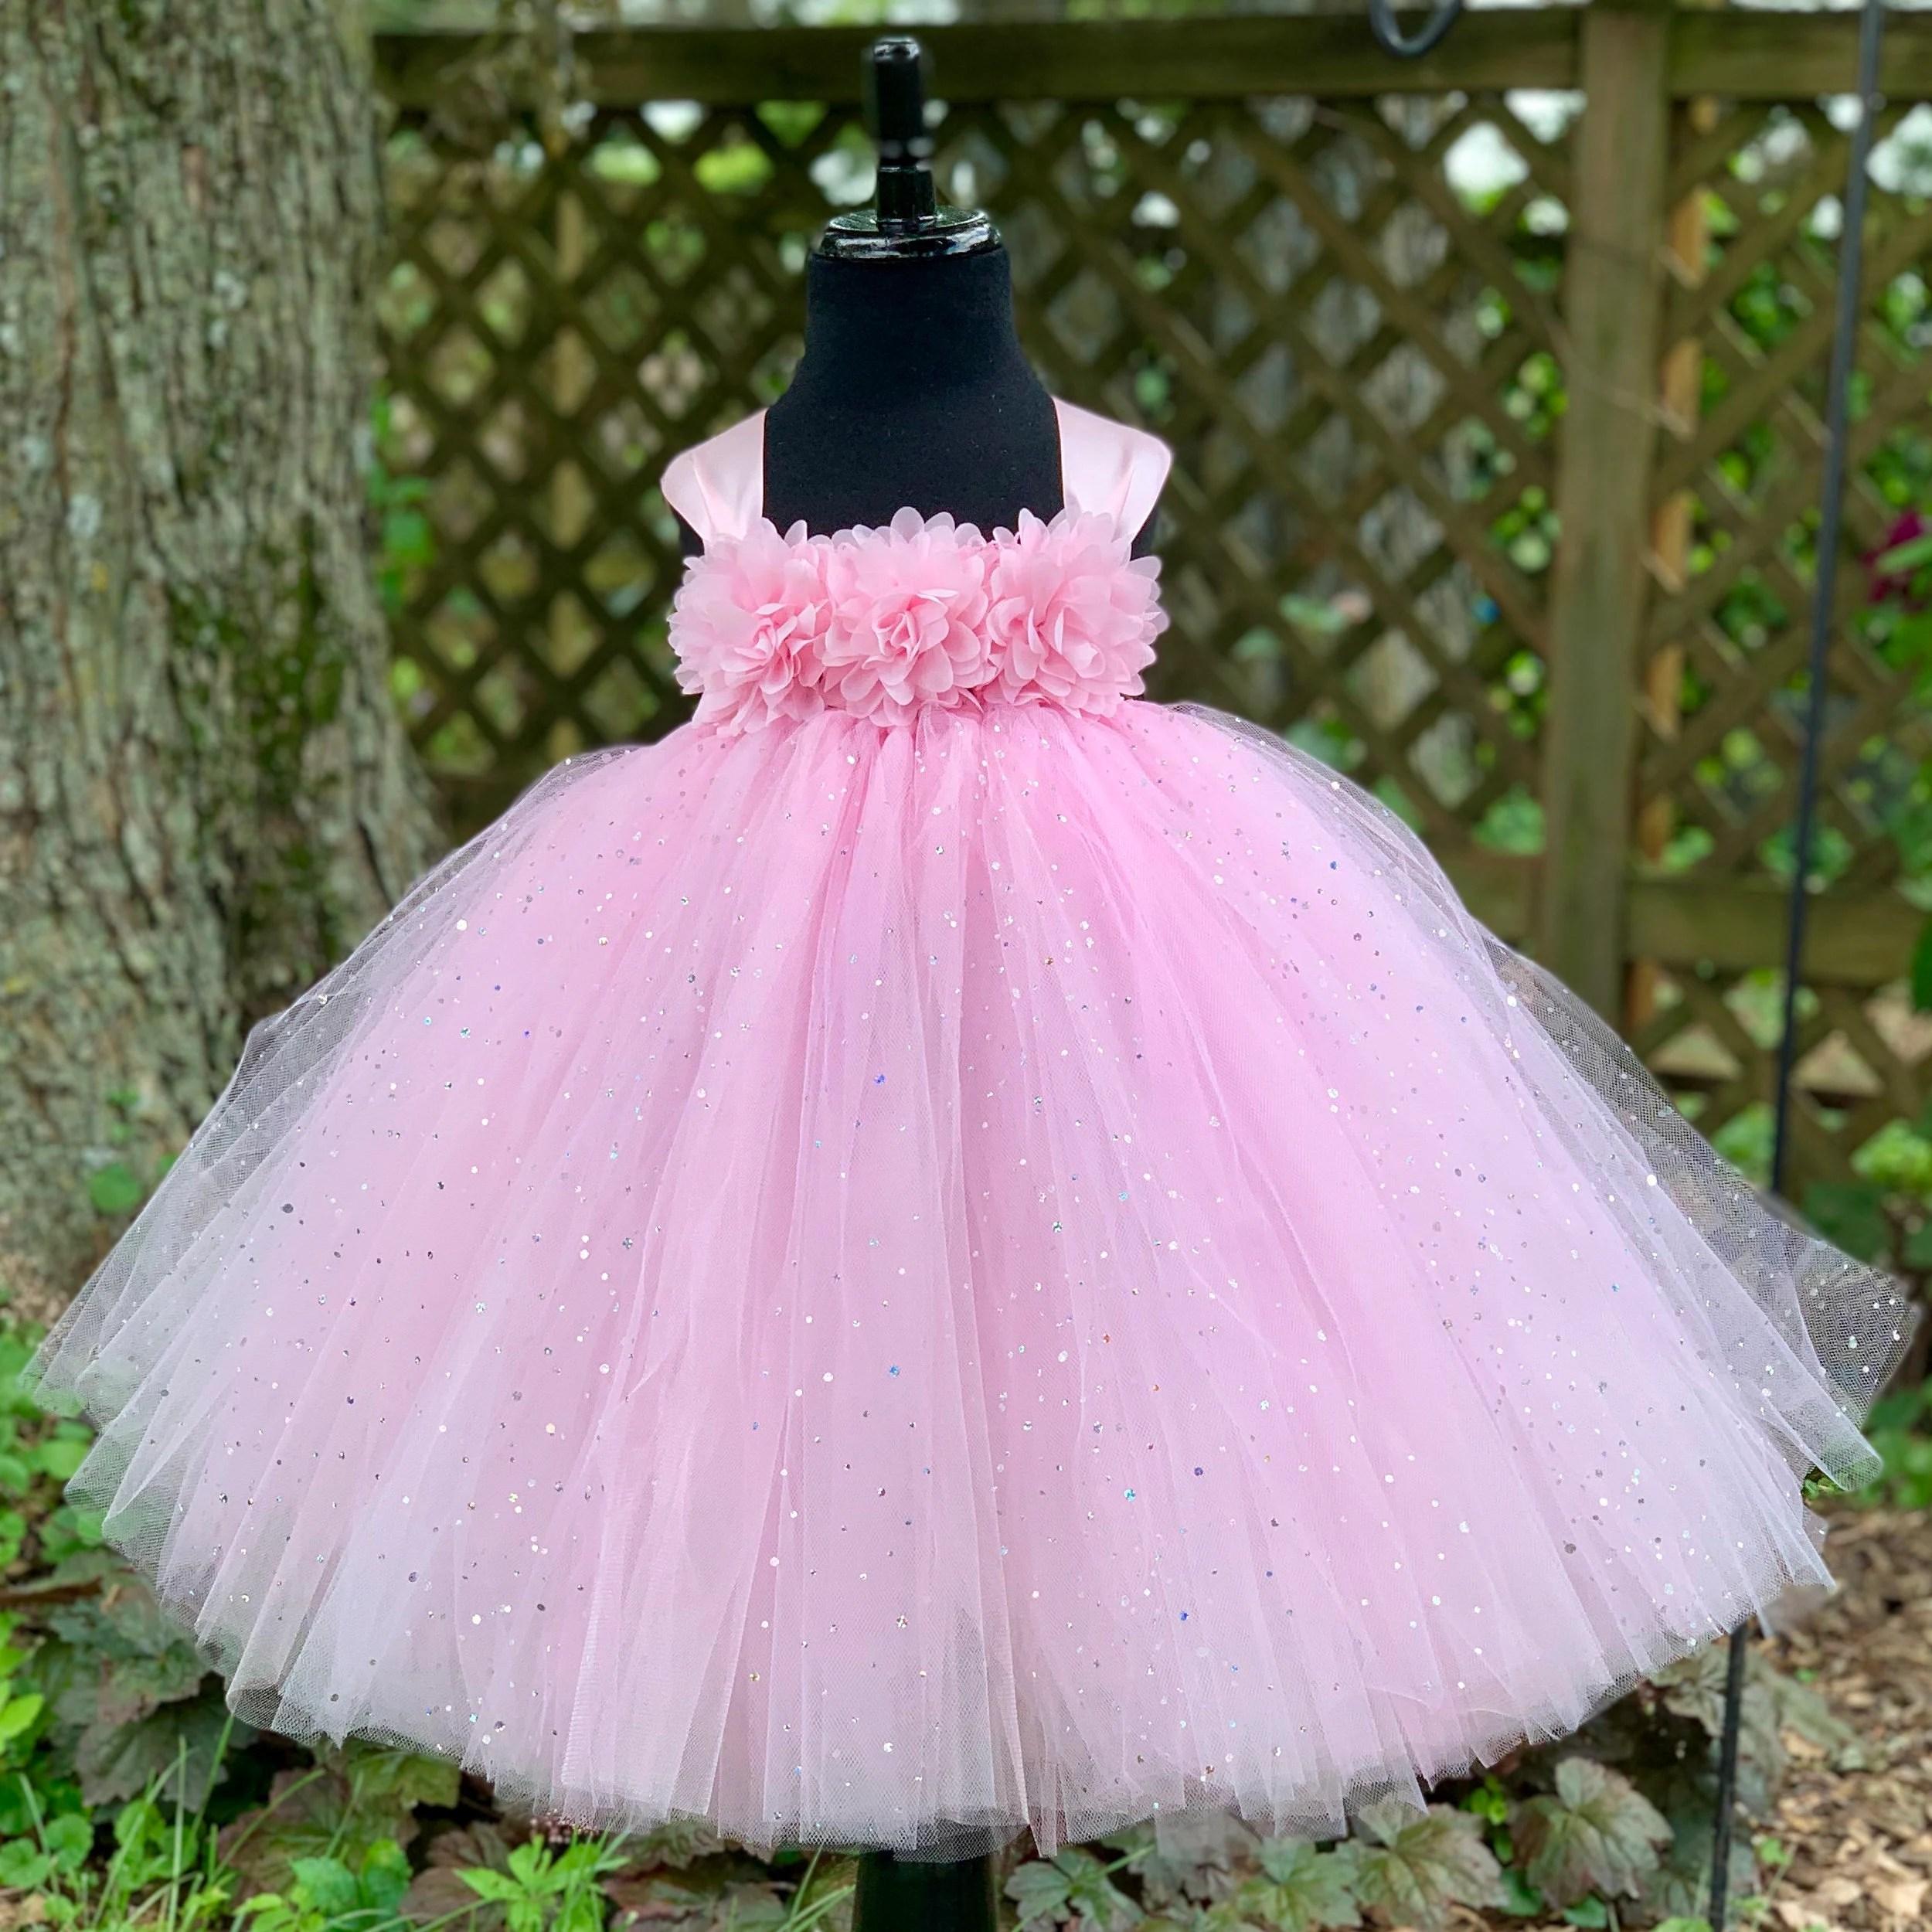 Pink Princess Tutu Dress For Girls Sparkle Dot Tulle Etsy